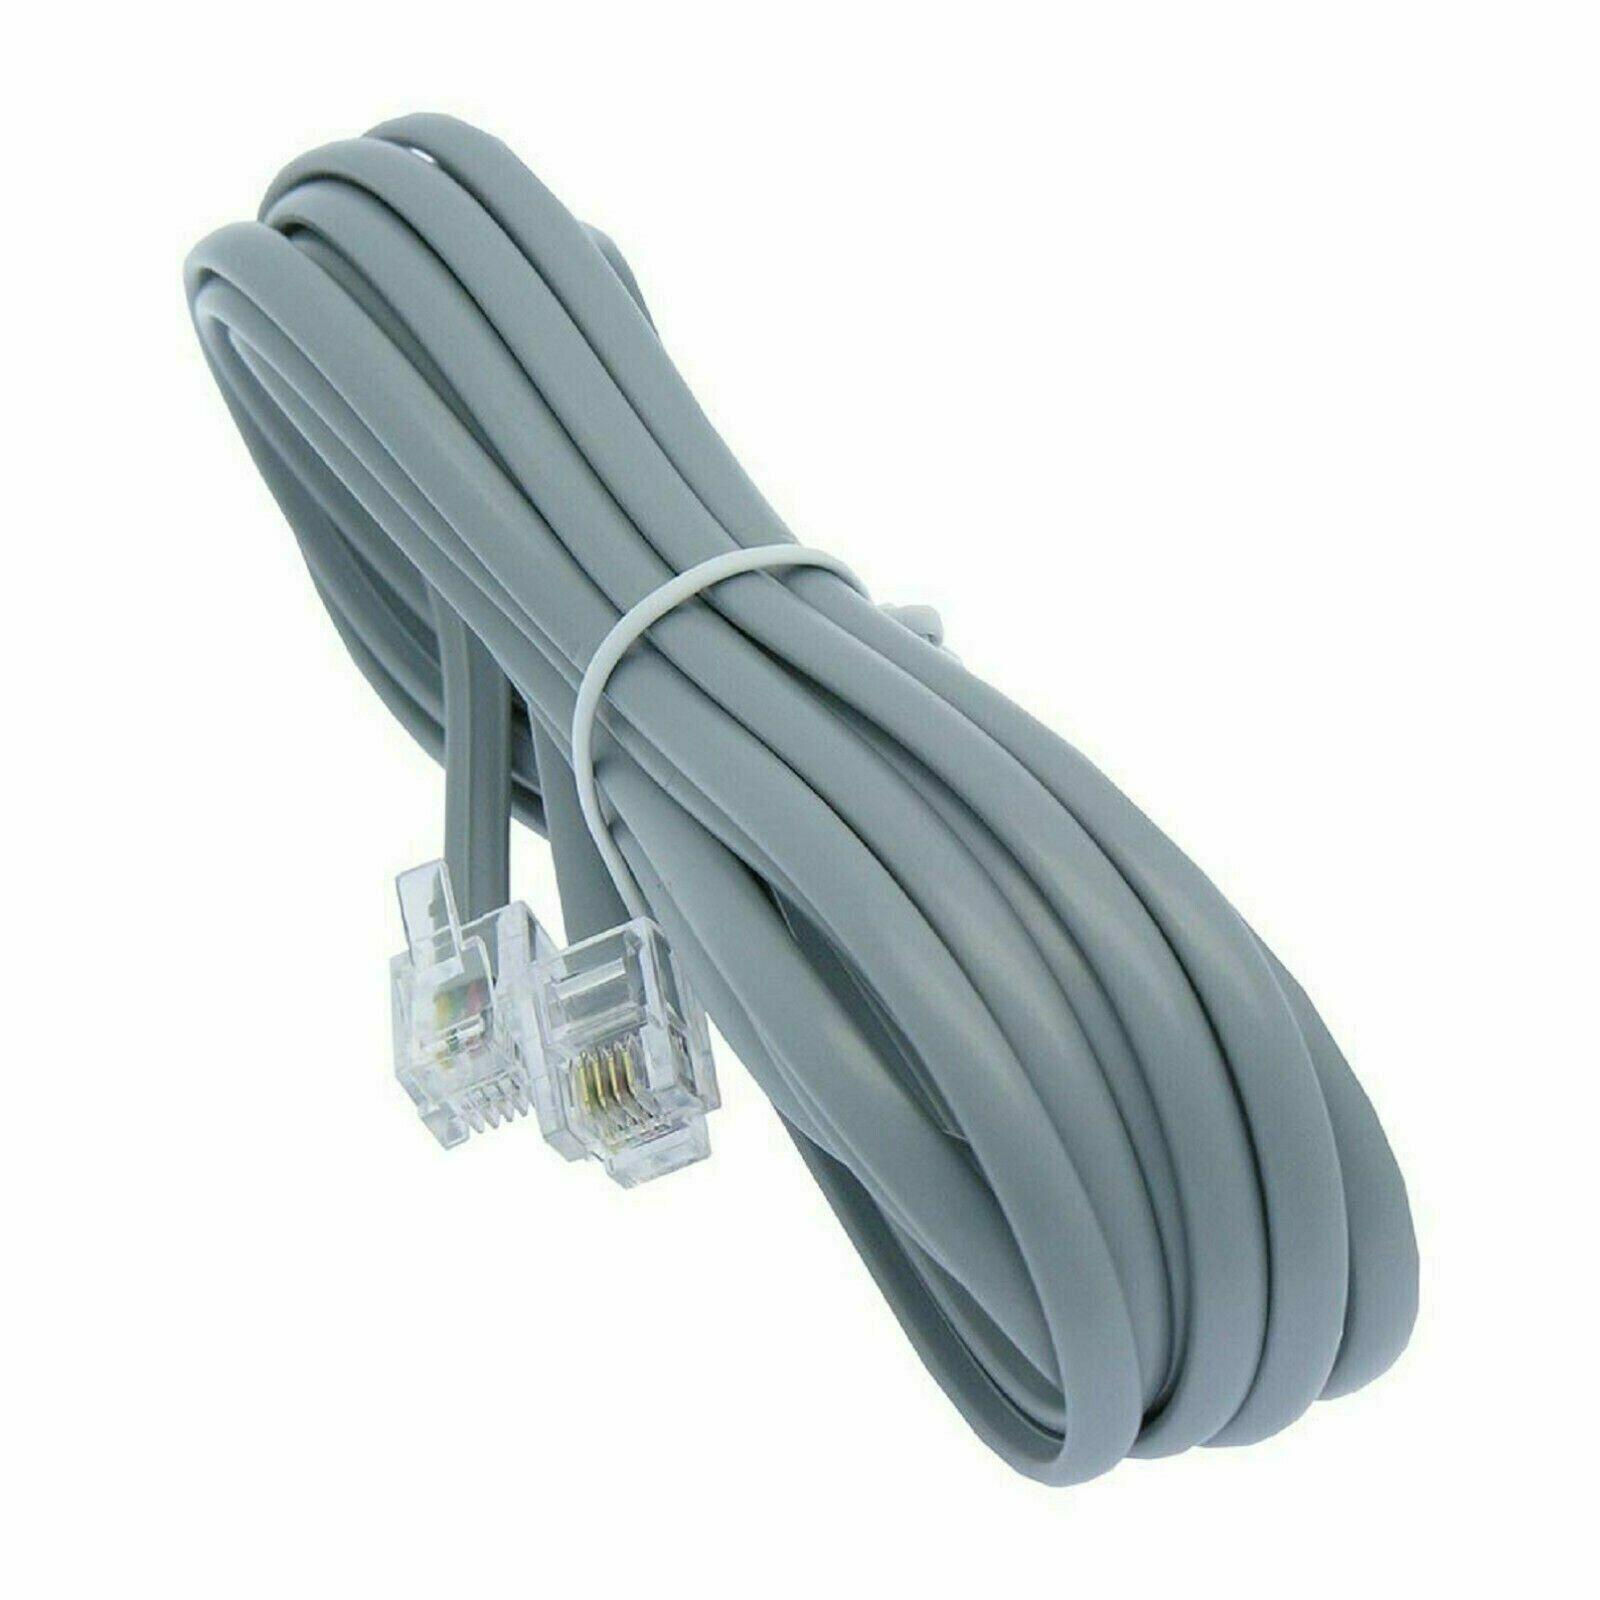 7ft line cord cable 6p6c rj12 rj11